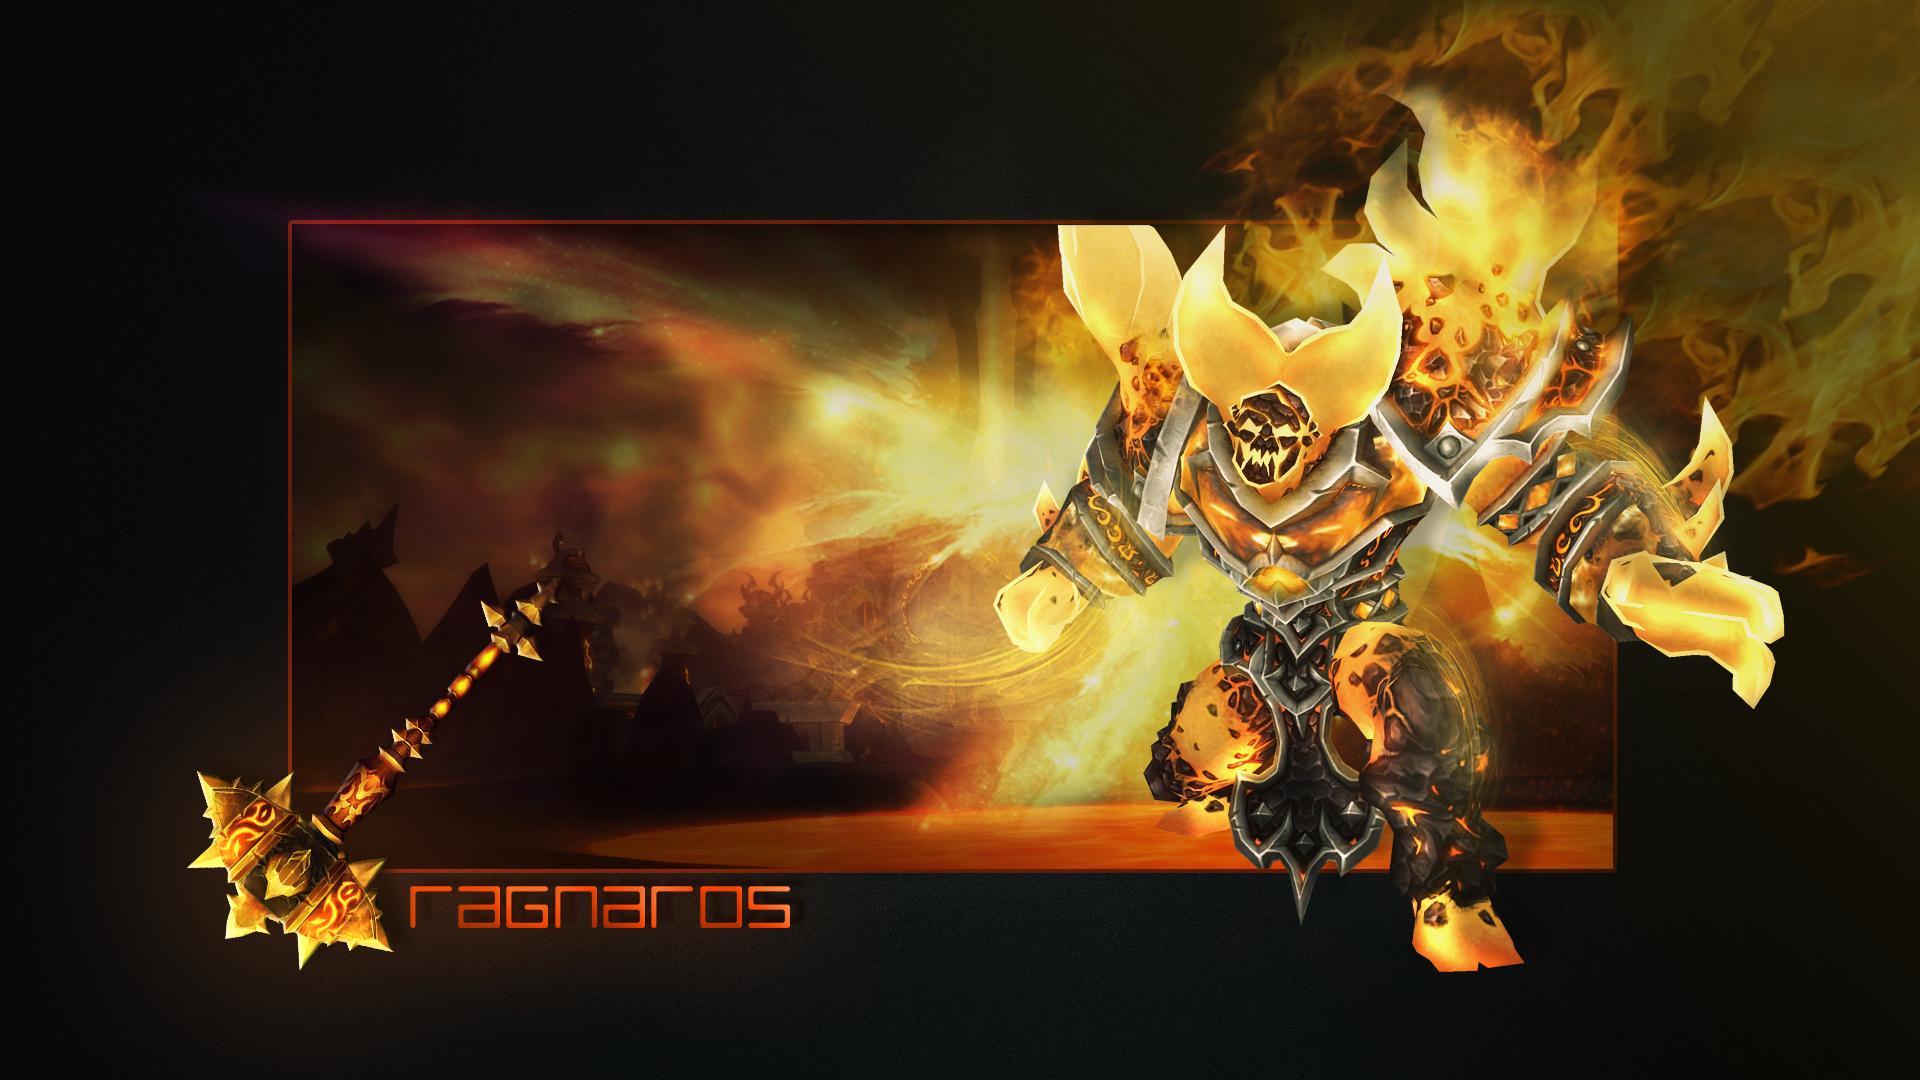 ragnaros the firelord wallpaper - photo #7